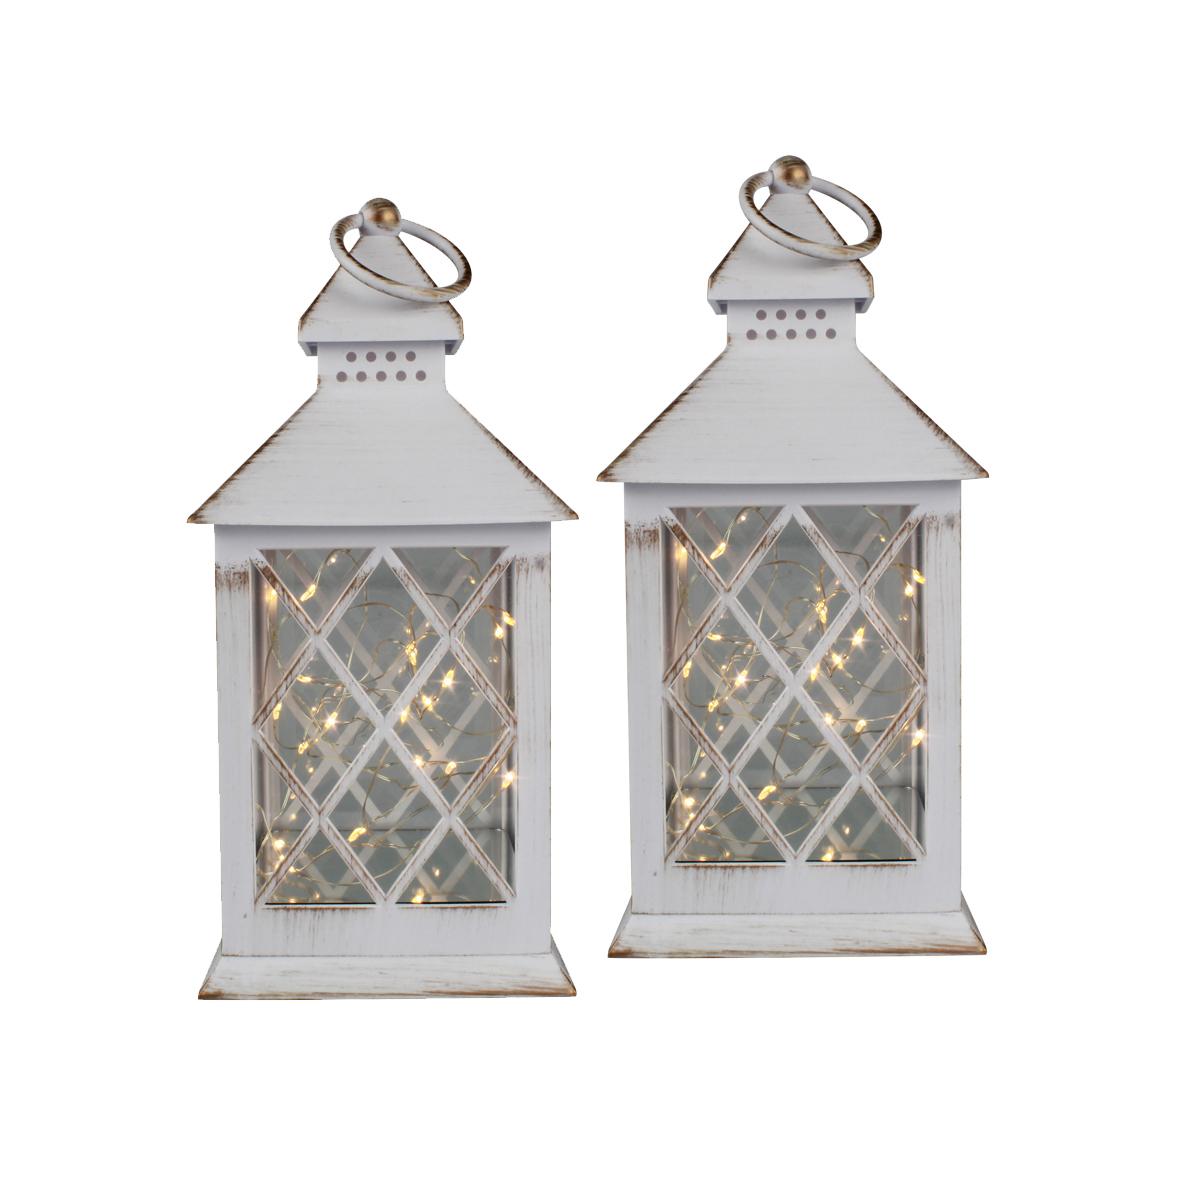 Conj. C/ 2 Lanternas Marroquinas Decorativas LED Brancas 27cm Verito